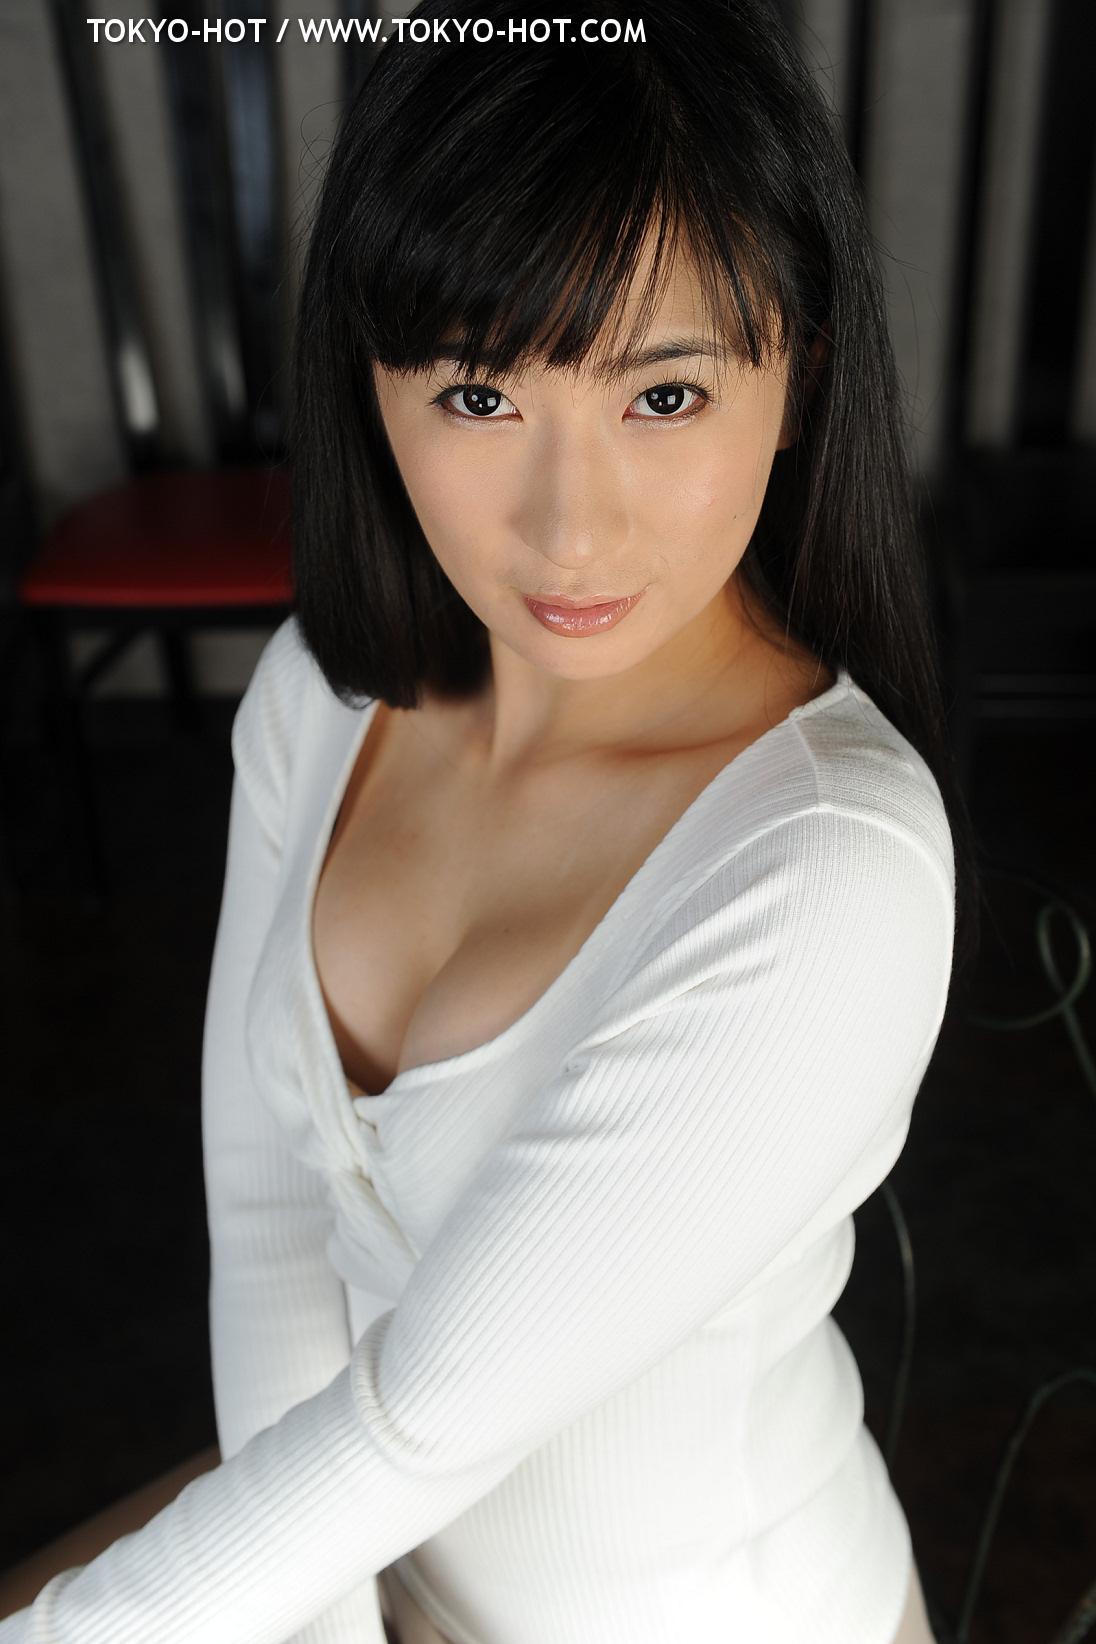 [Tokyo-Hot] 2017-09-07 e1156 RiovKobayashi 小林莉緒 [803P401MB] e1156rio_kobayashi0003-jpg